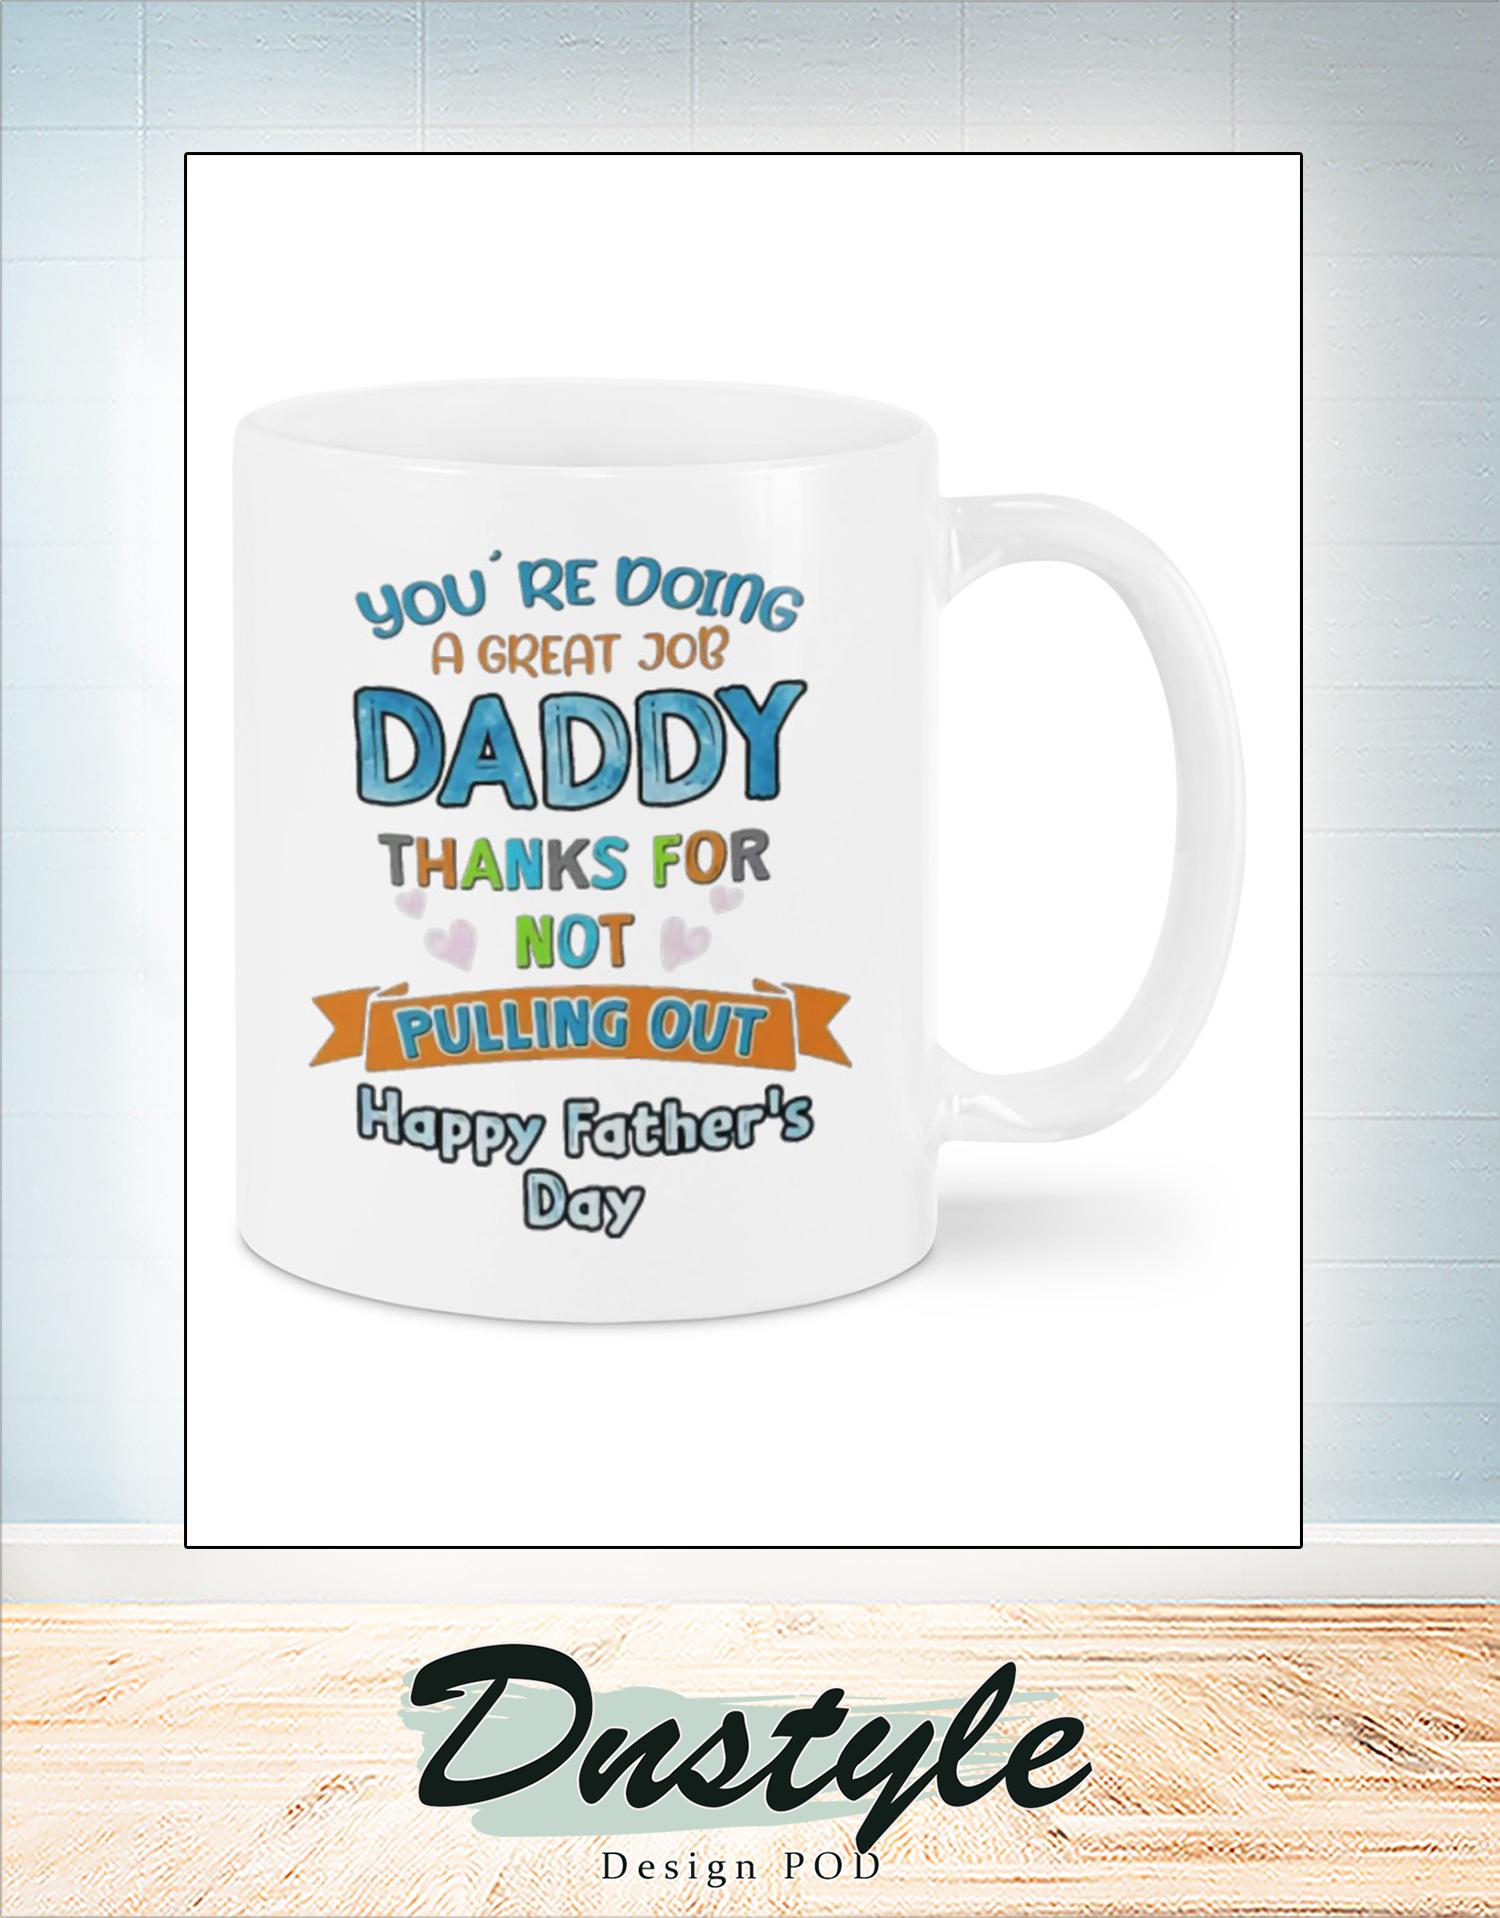 You're doing a great job daddy mug